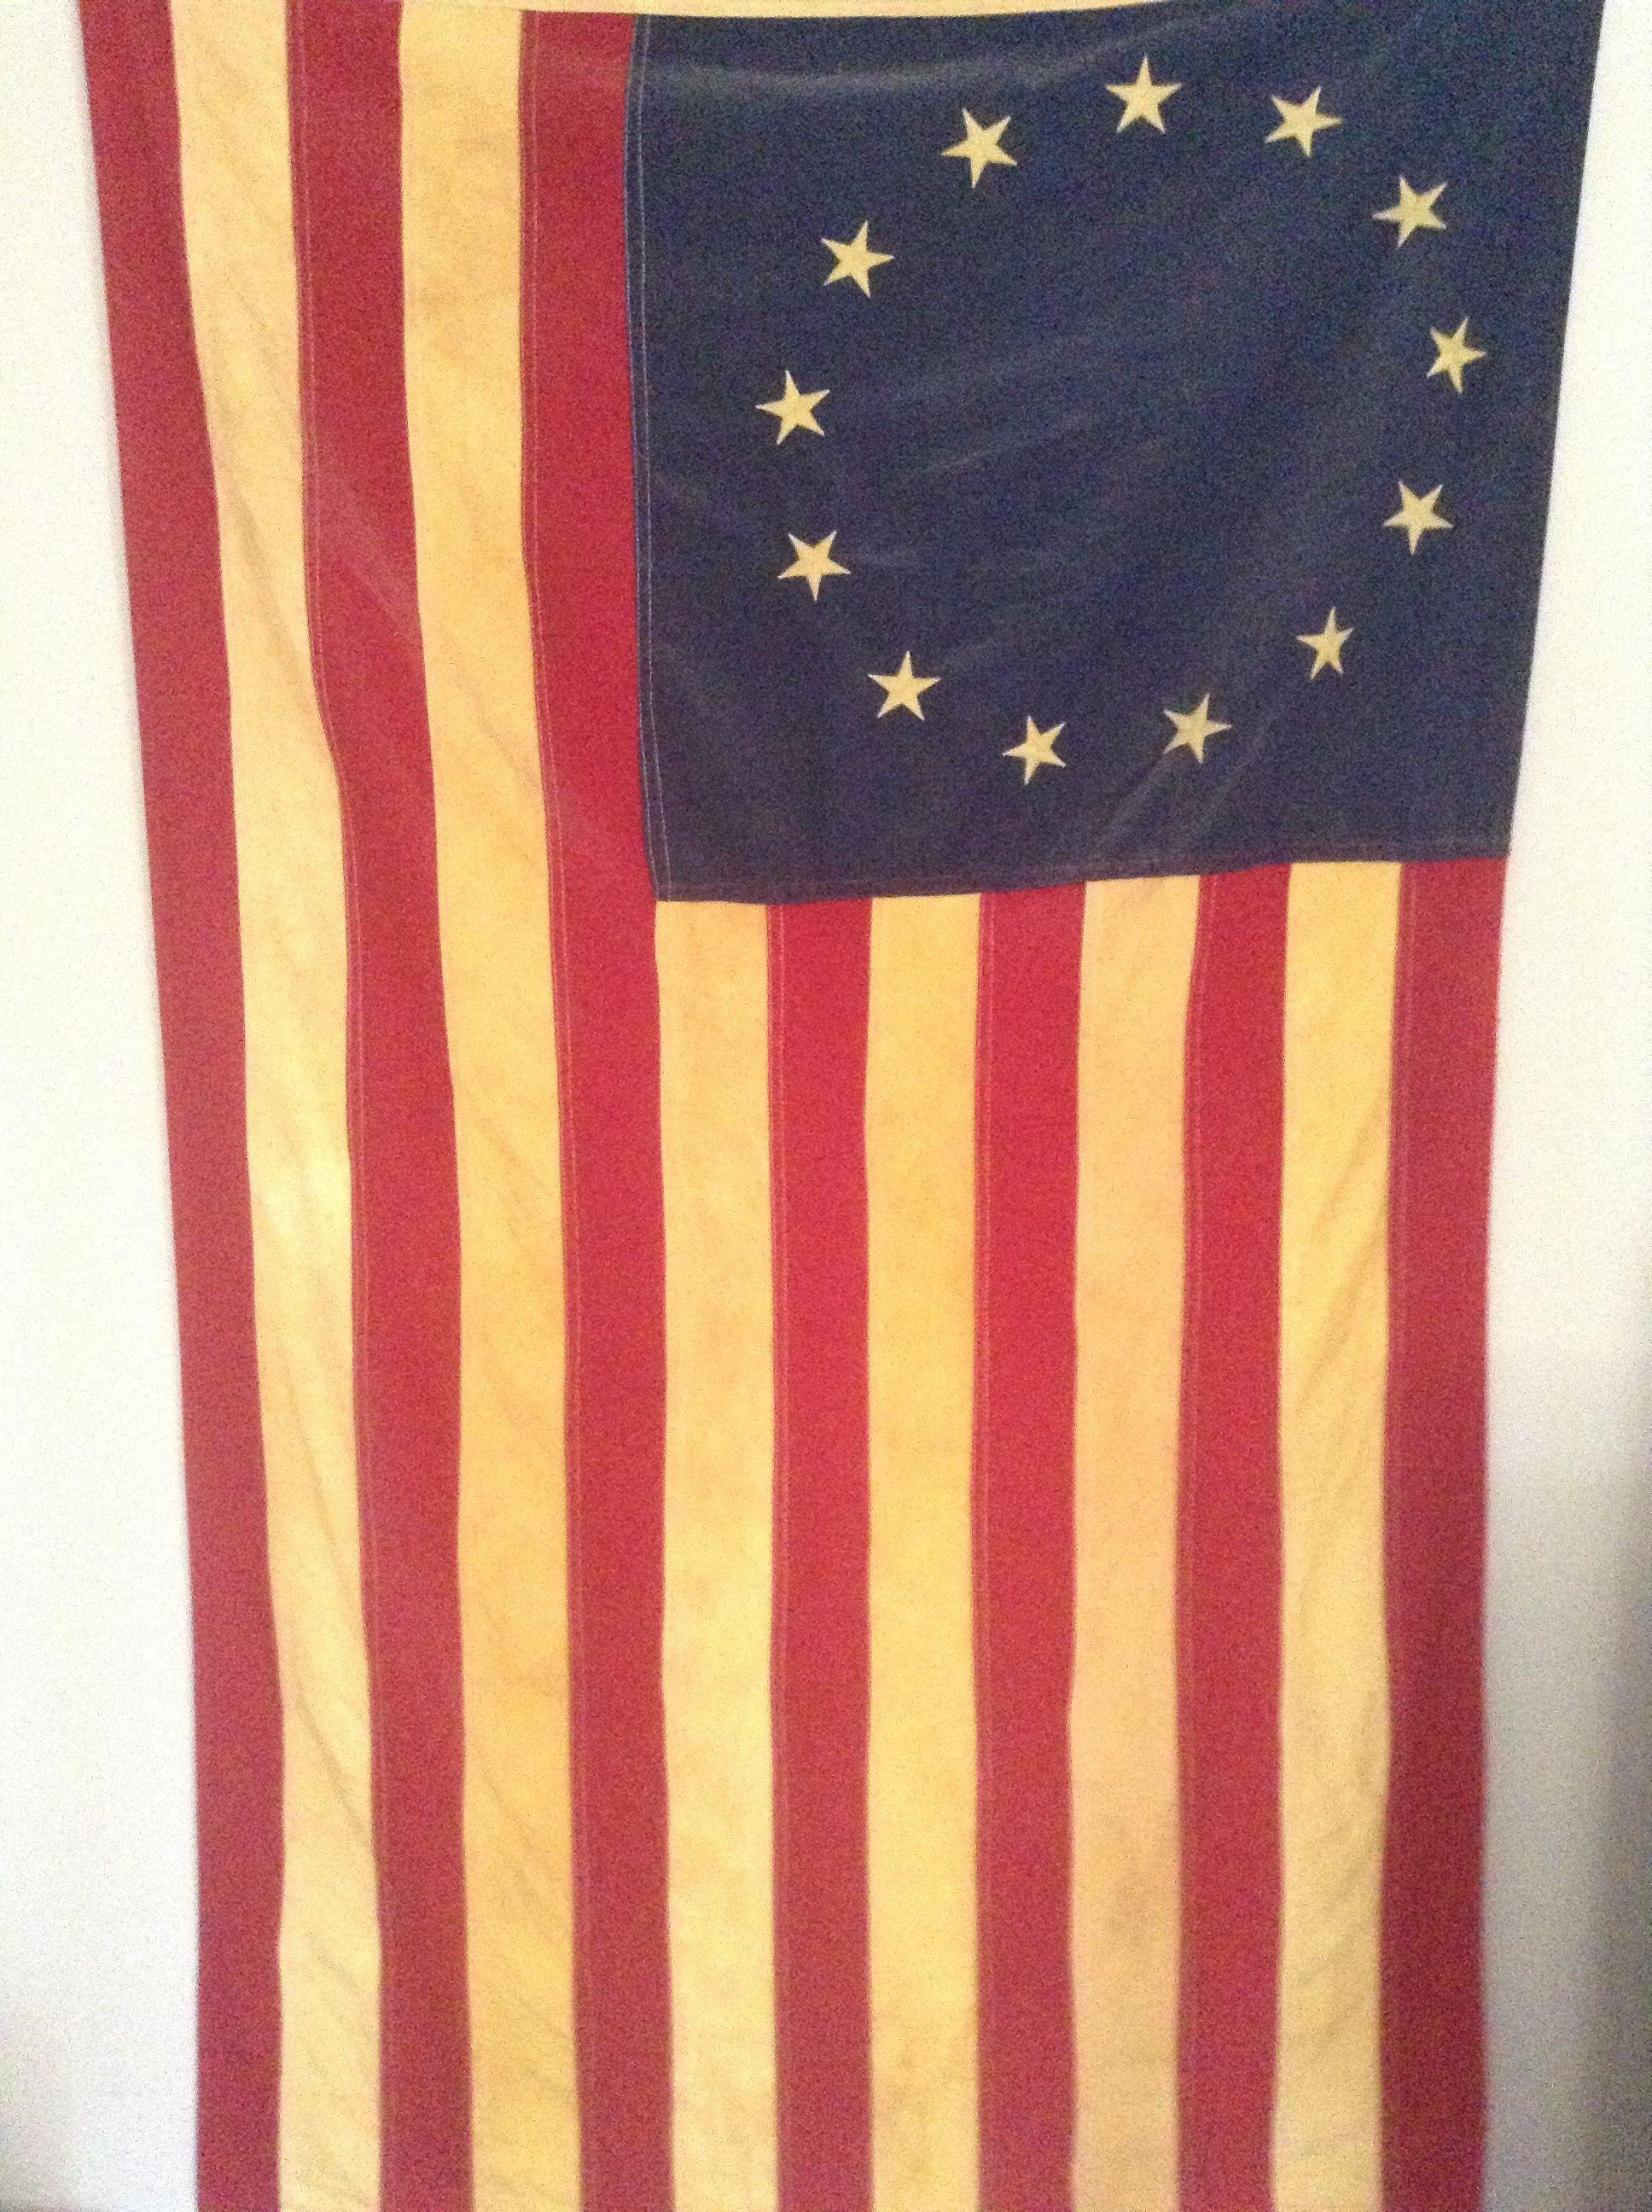 Original 13 Colonies United States Flag American Nationalism United States Flag American Nationalism America Flag